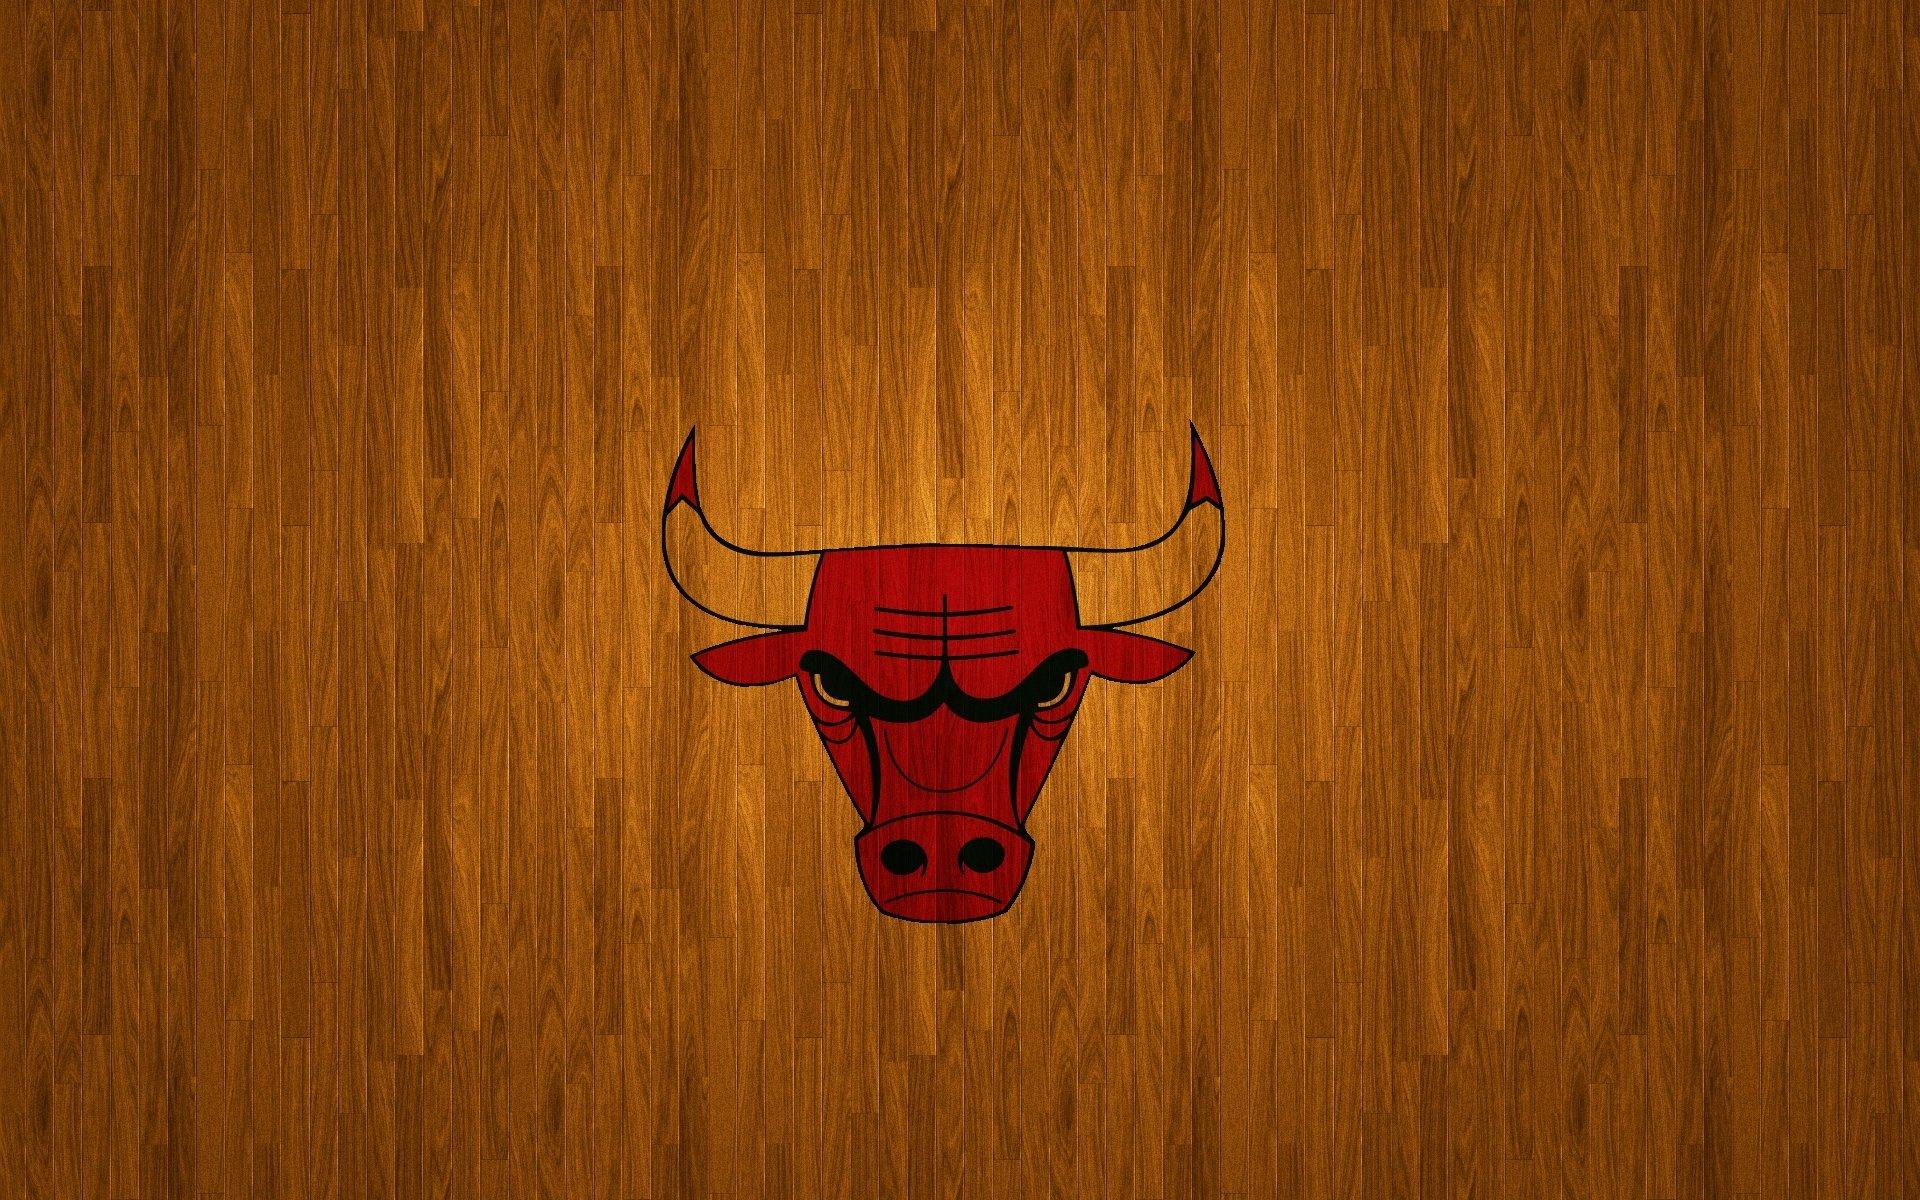 Nike Basketball Hd Wallpaper Chicago Bulls Full Hd Fondo De Pantalla And Fondo De